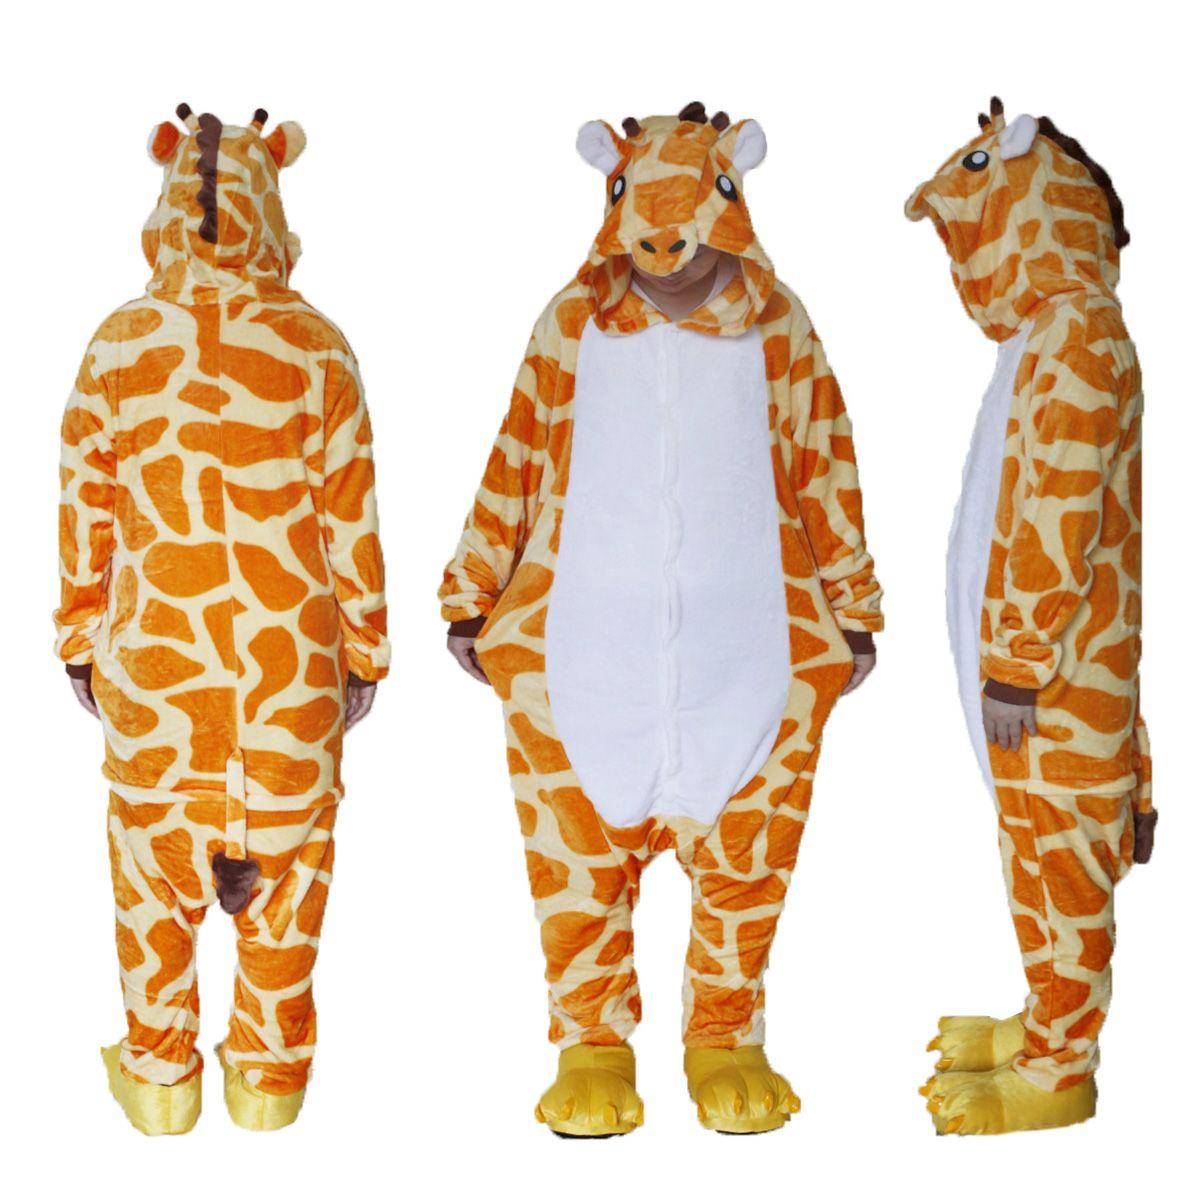 21206277e1 Unisex Adult Pajamas Plush One Piece Cosplay Giraffe Animal Costume  Halloween Costumes Themes For Groups Halloween Costumes For 3 People Group  From Dhwiner